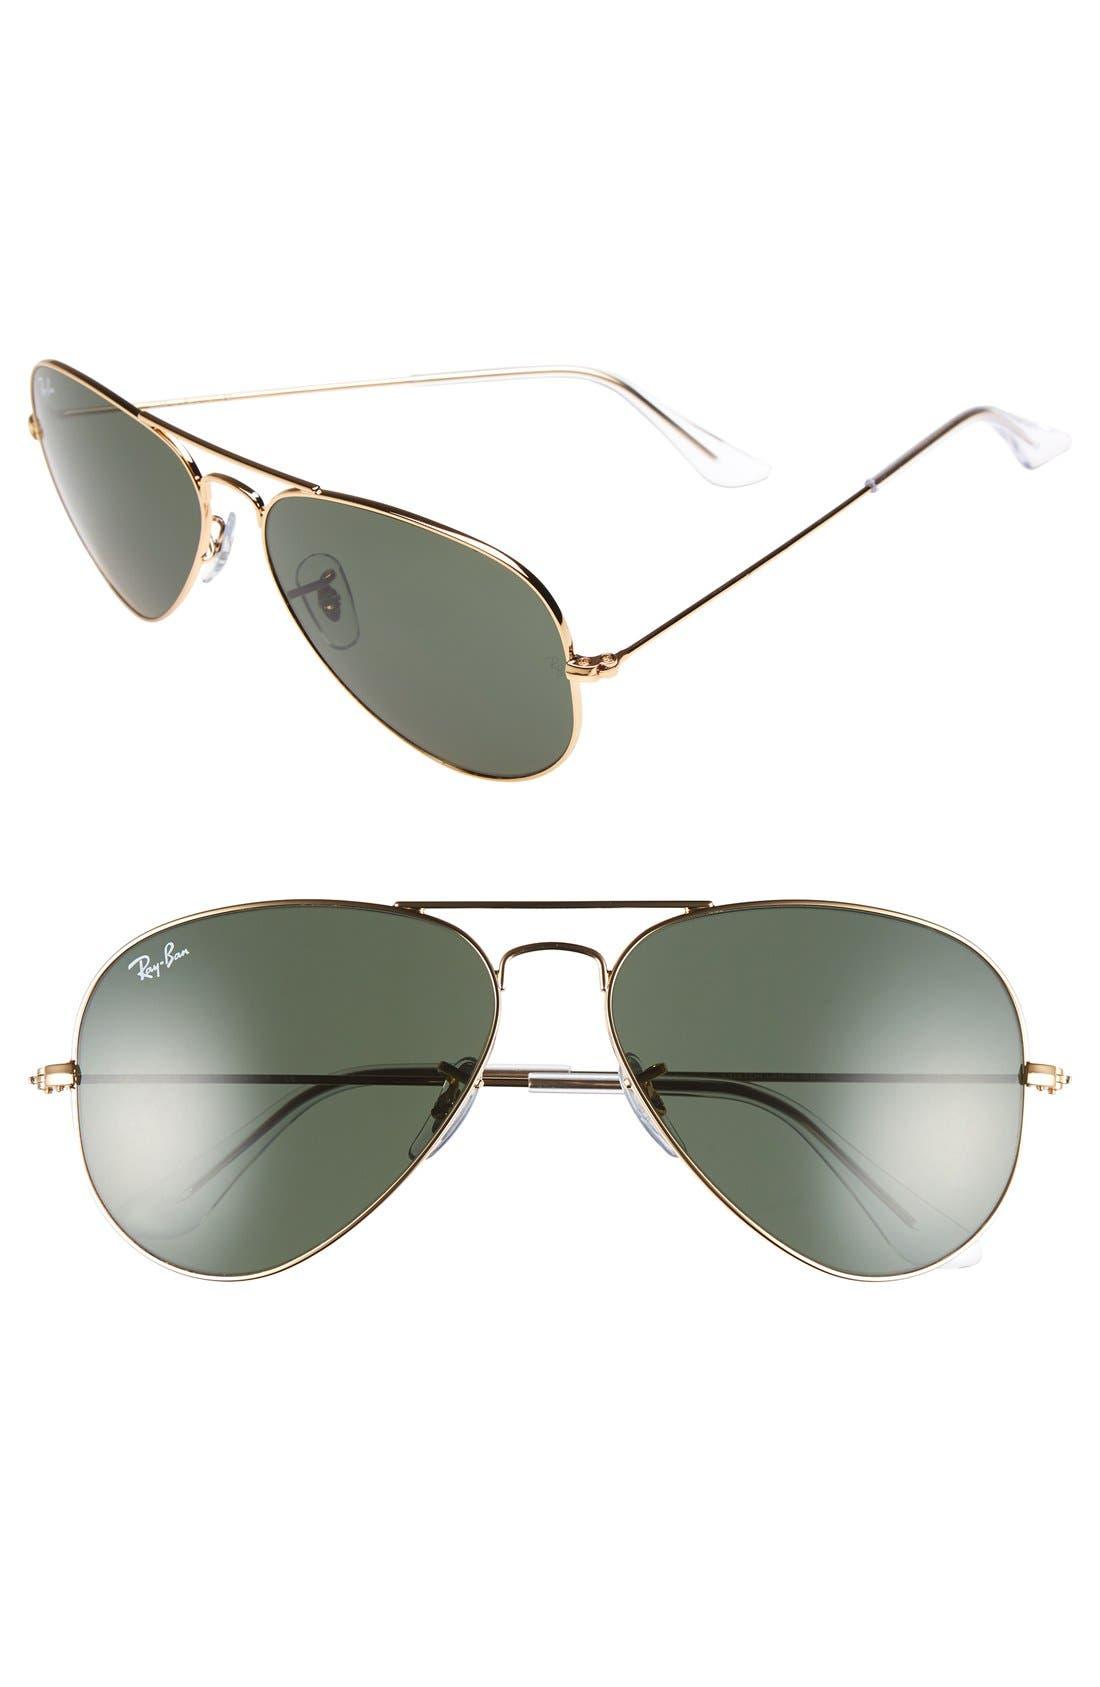 Ray Ban Sunglasses ORIGINAL AVIATOR 58MM SUNGLASSES - GOLD/ GREY GREEN